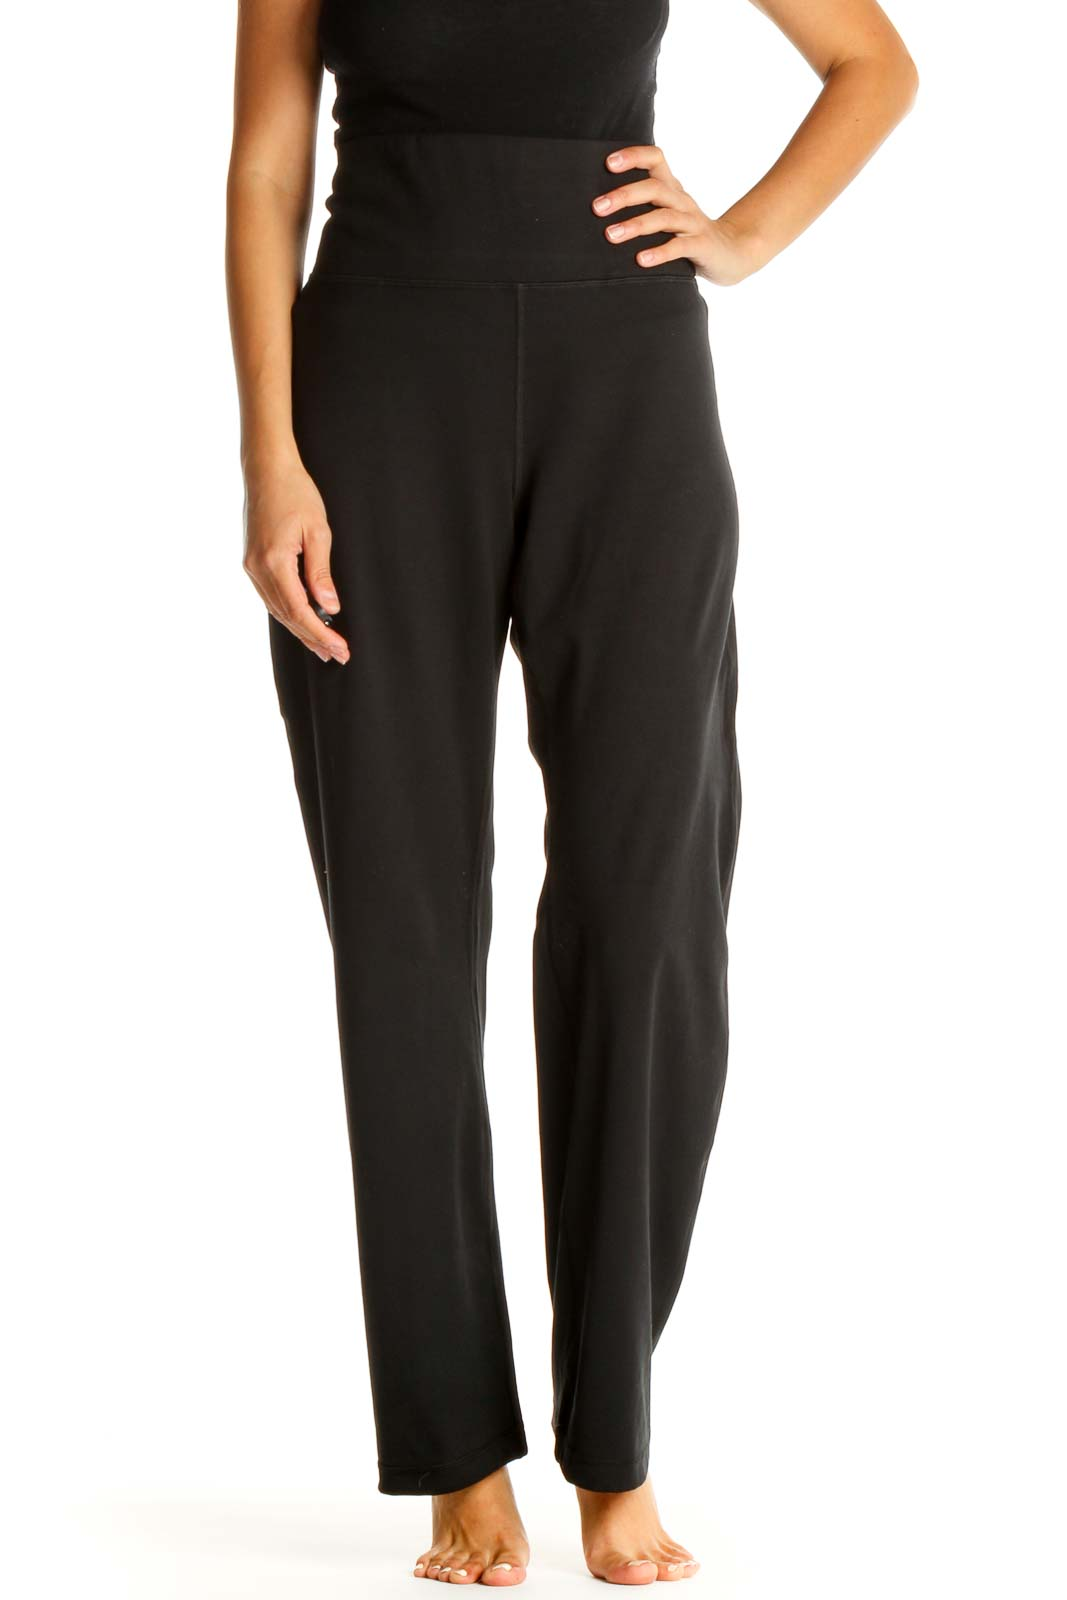 Black Solid Classic Yoga Pants Front